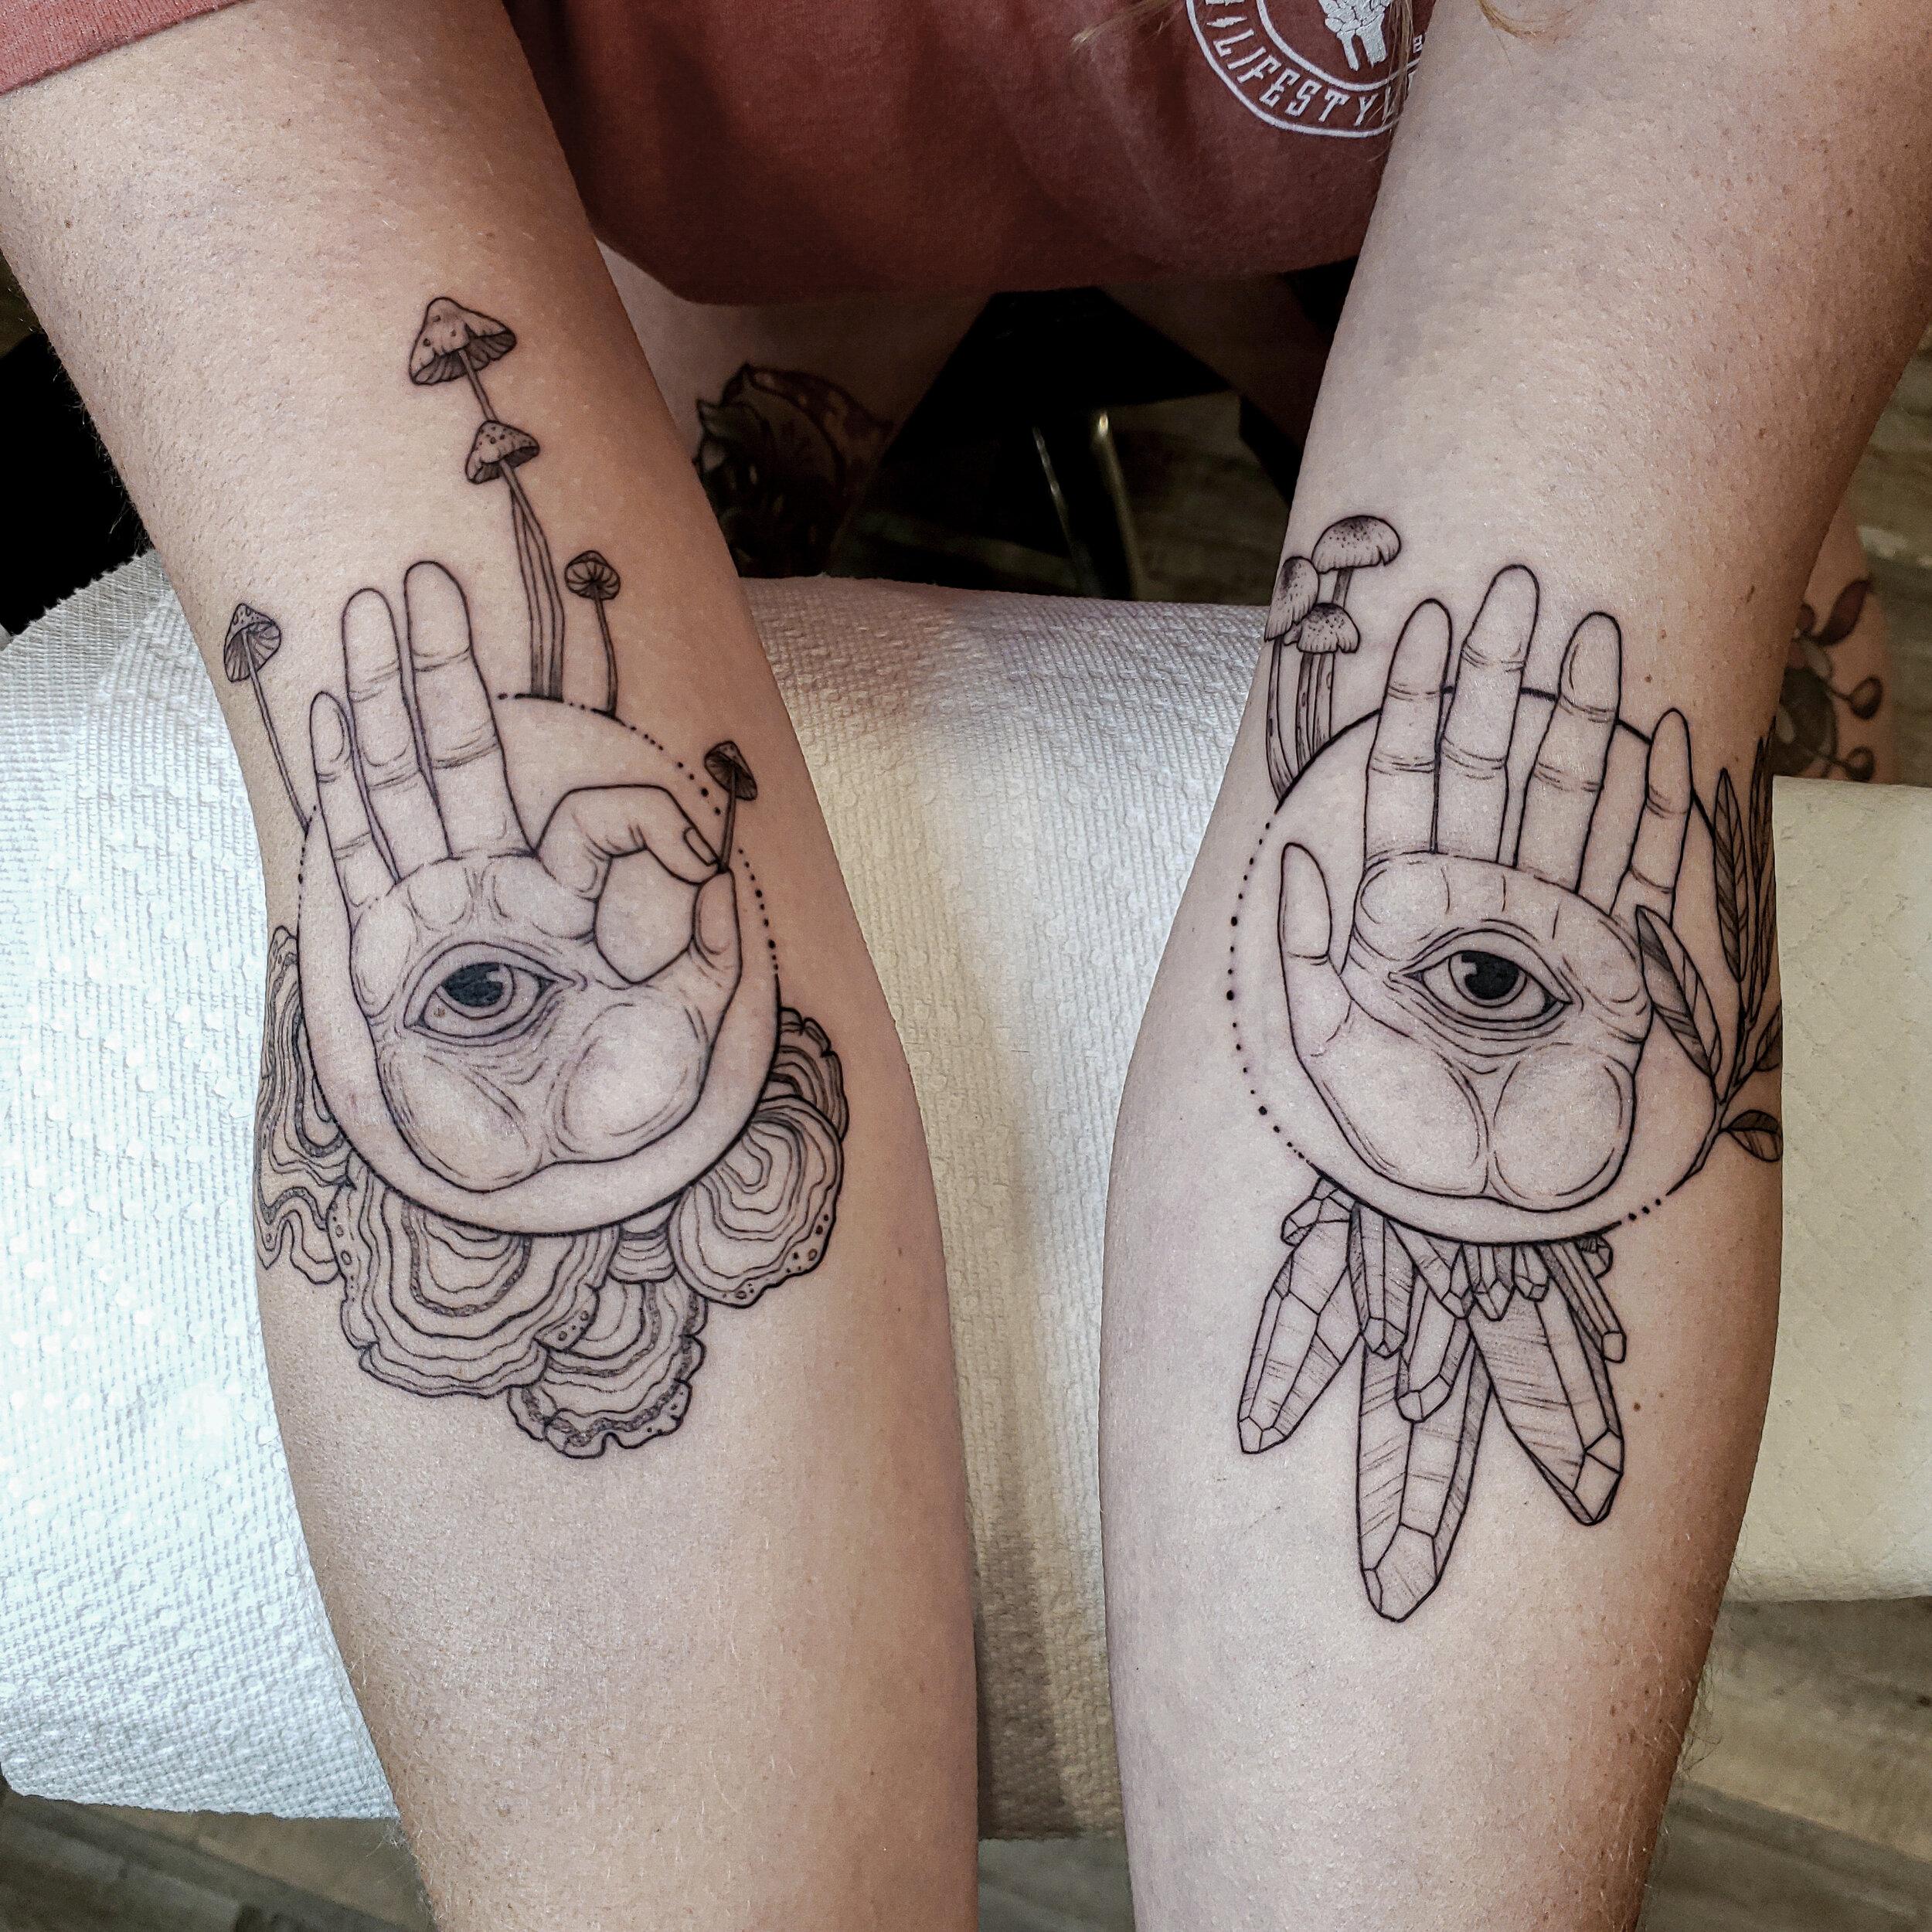 Tattoo Designs Alison Onyx Tattoos The best 66 hand tattoos! tattoo designs alison onyx tattoos